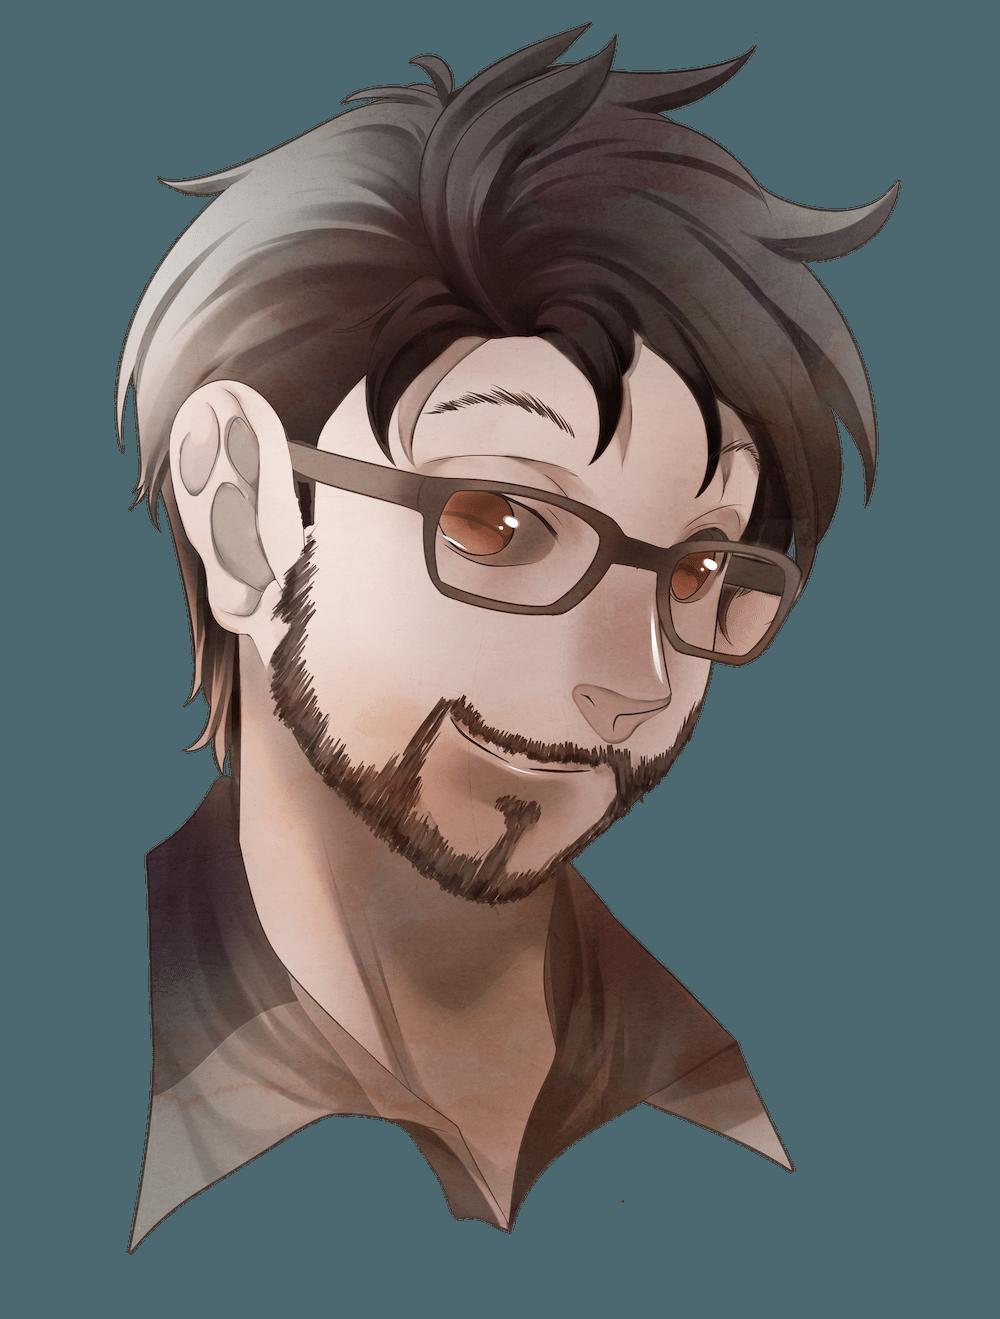 Anime Portrait of Chase Baker by Kura-Ou via ArtCorgi